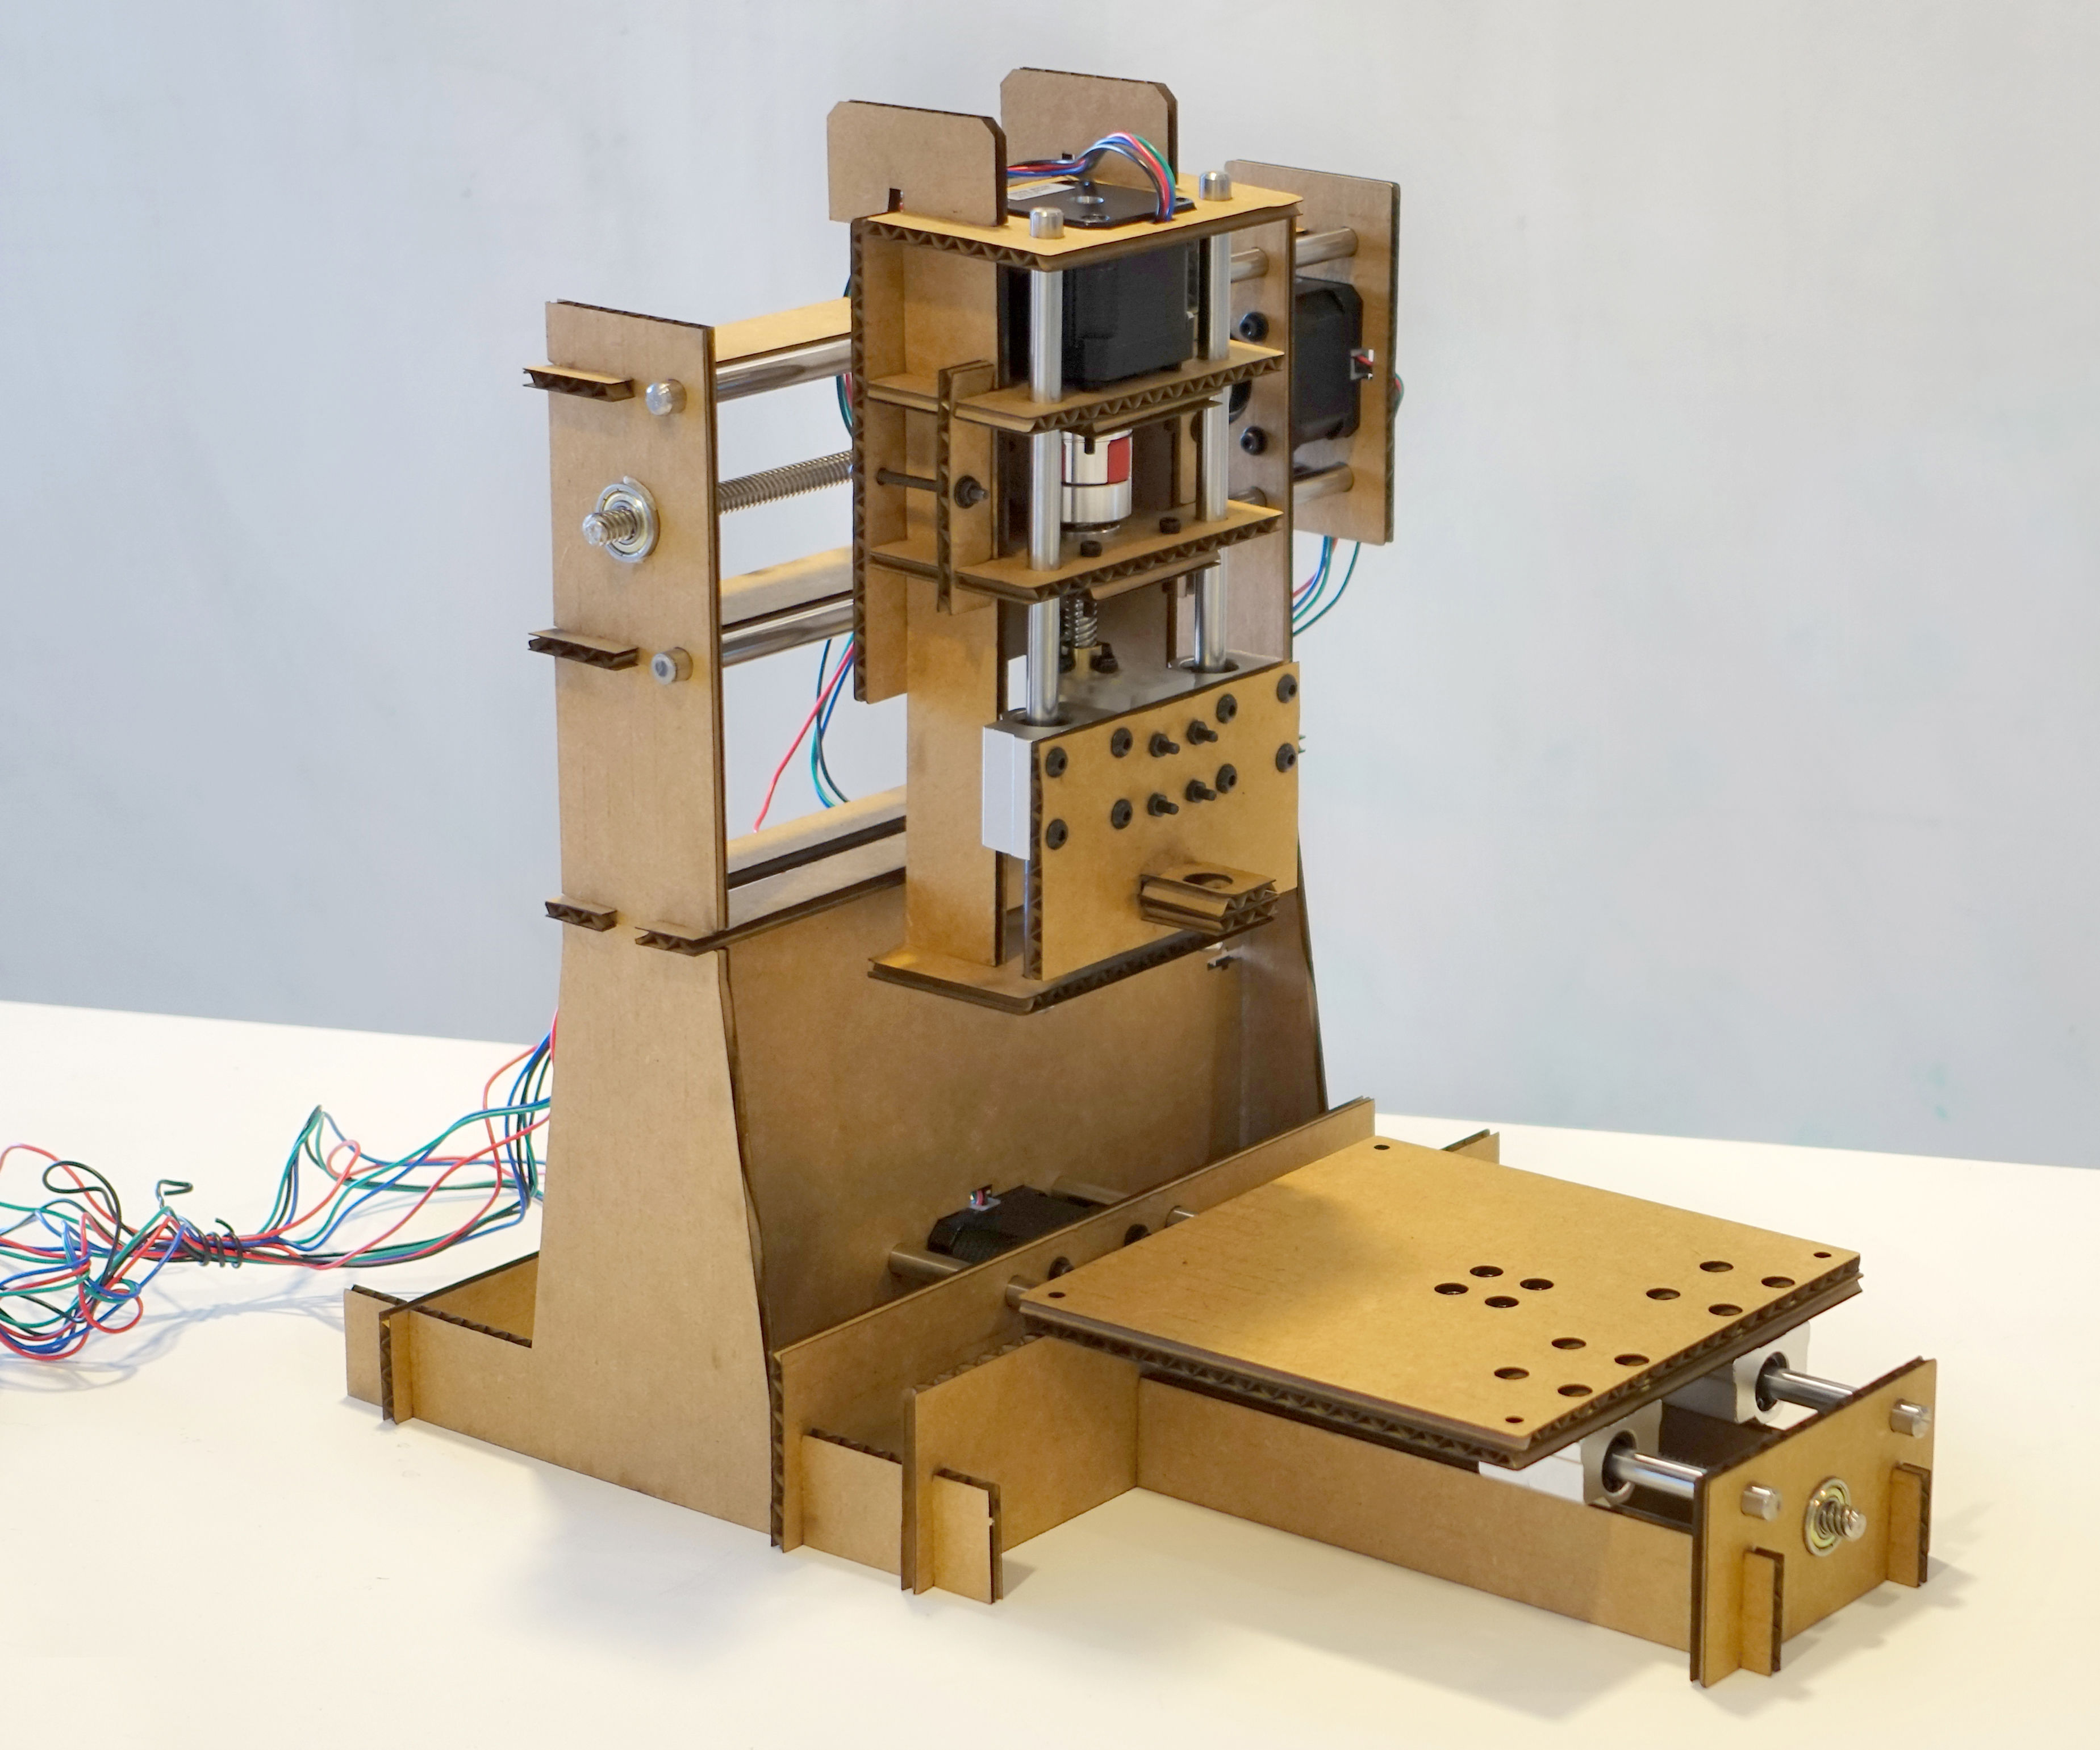 Press Fit Cardboard CNC Machine